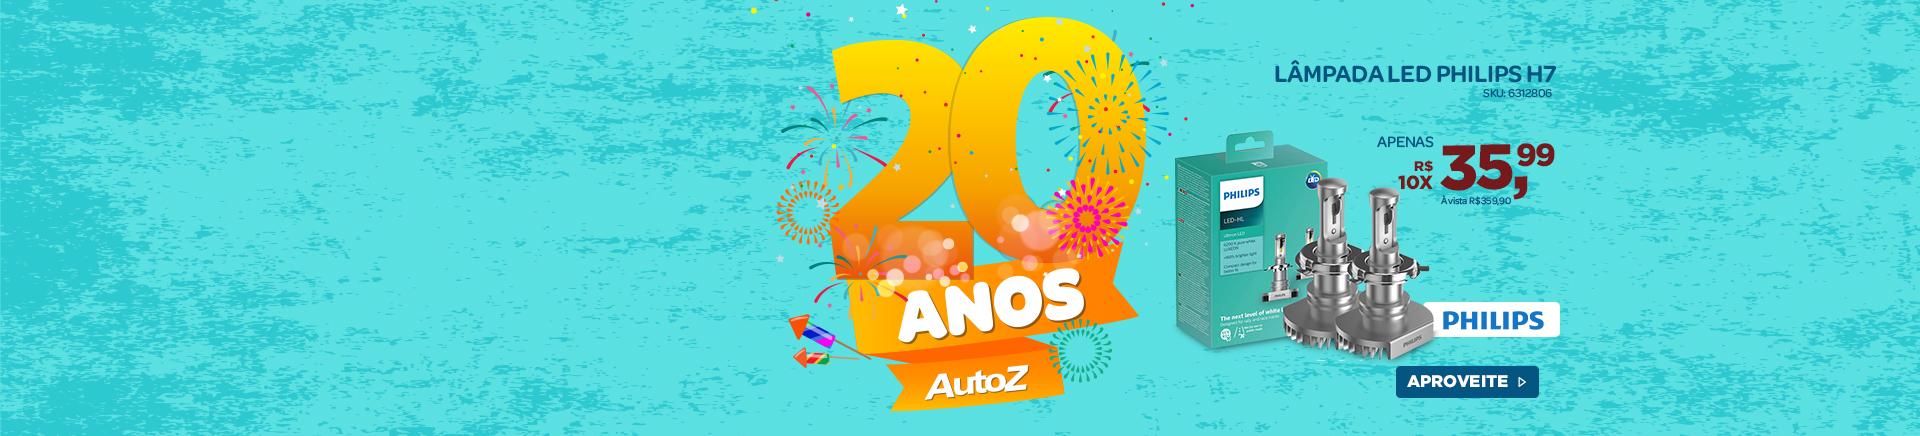 Aniversario AutoZ -Lampada